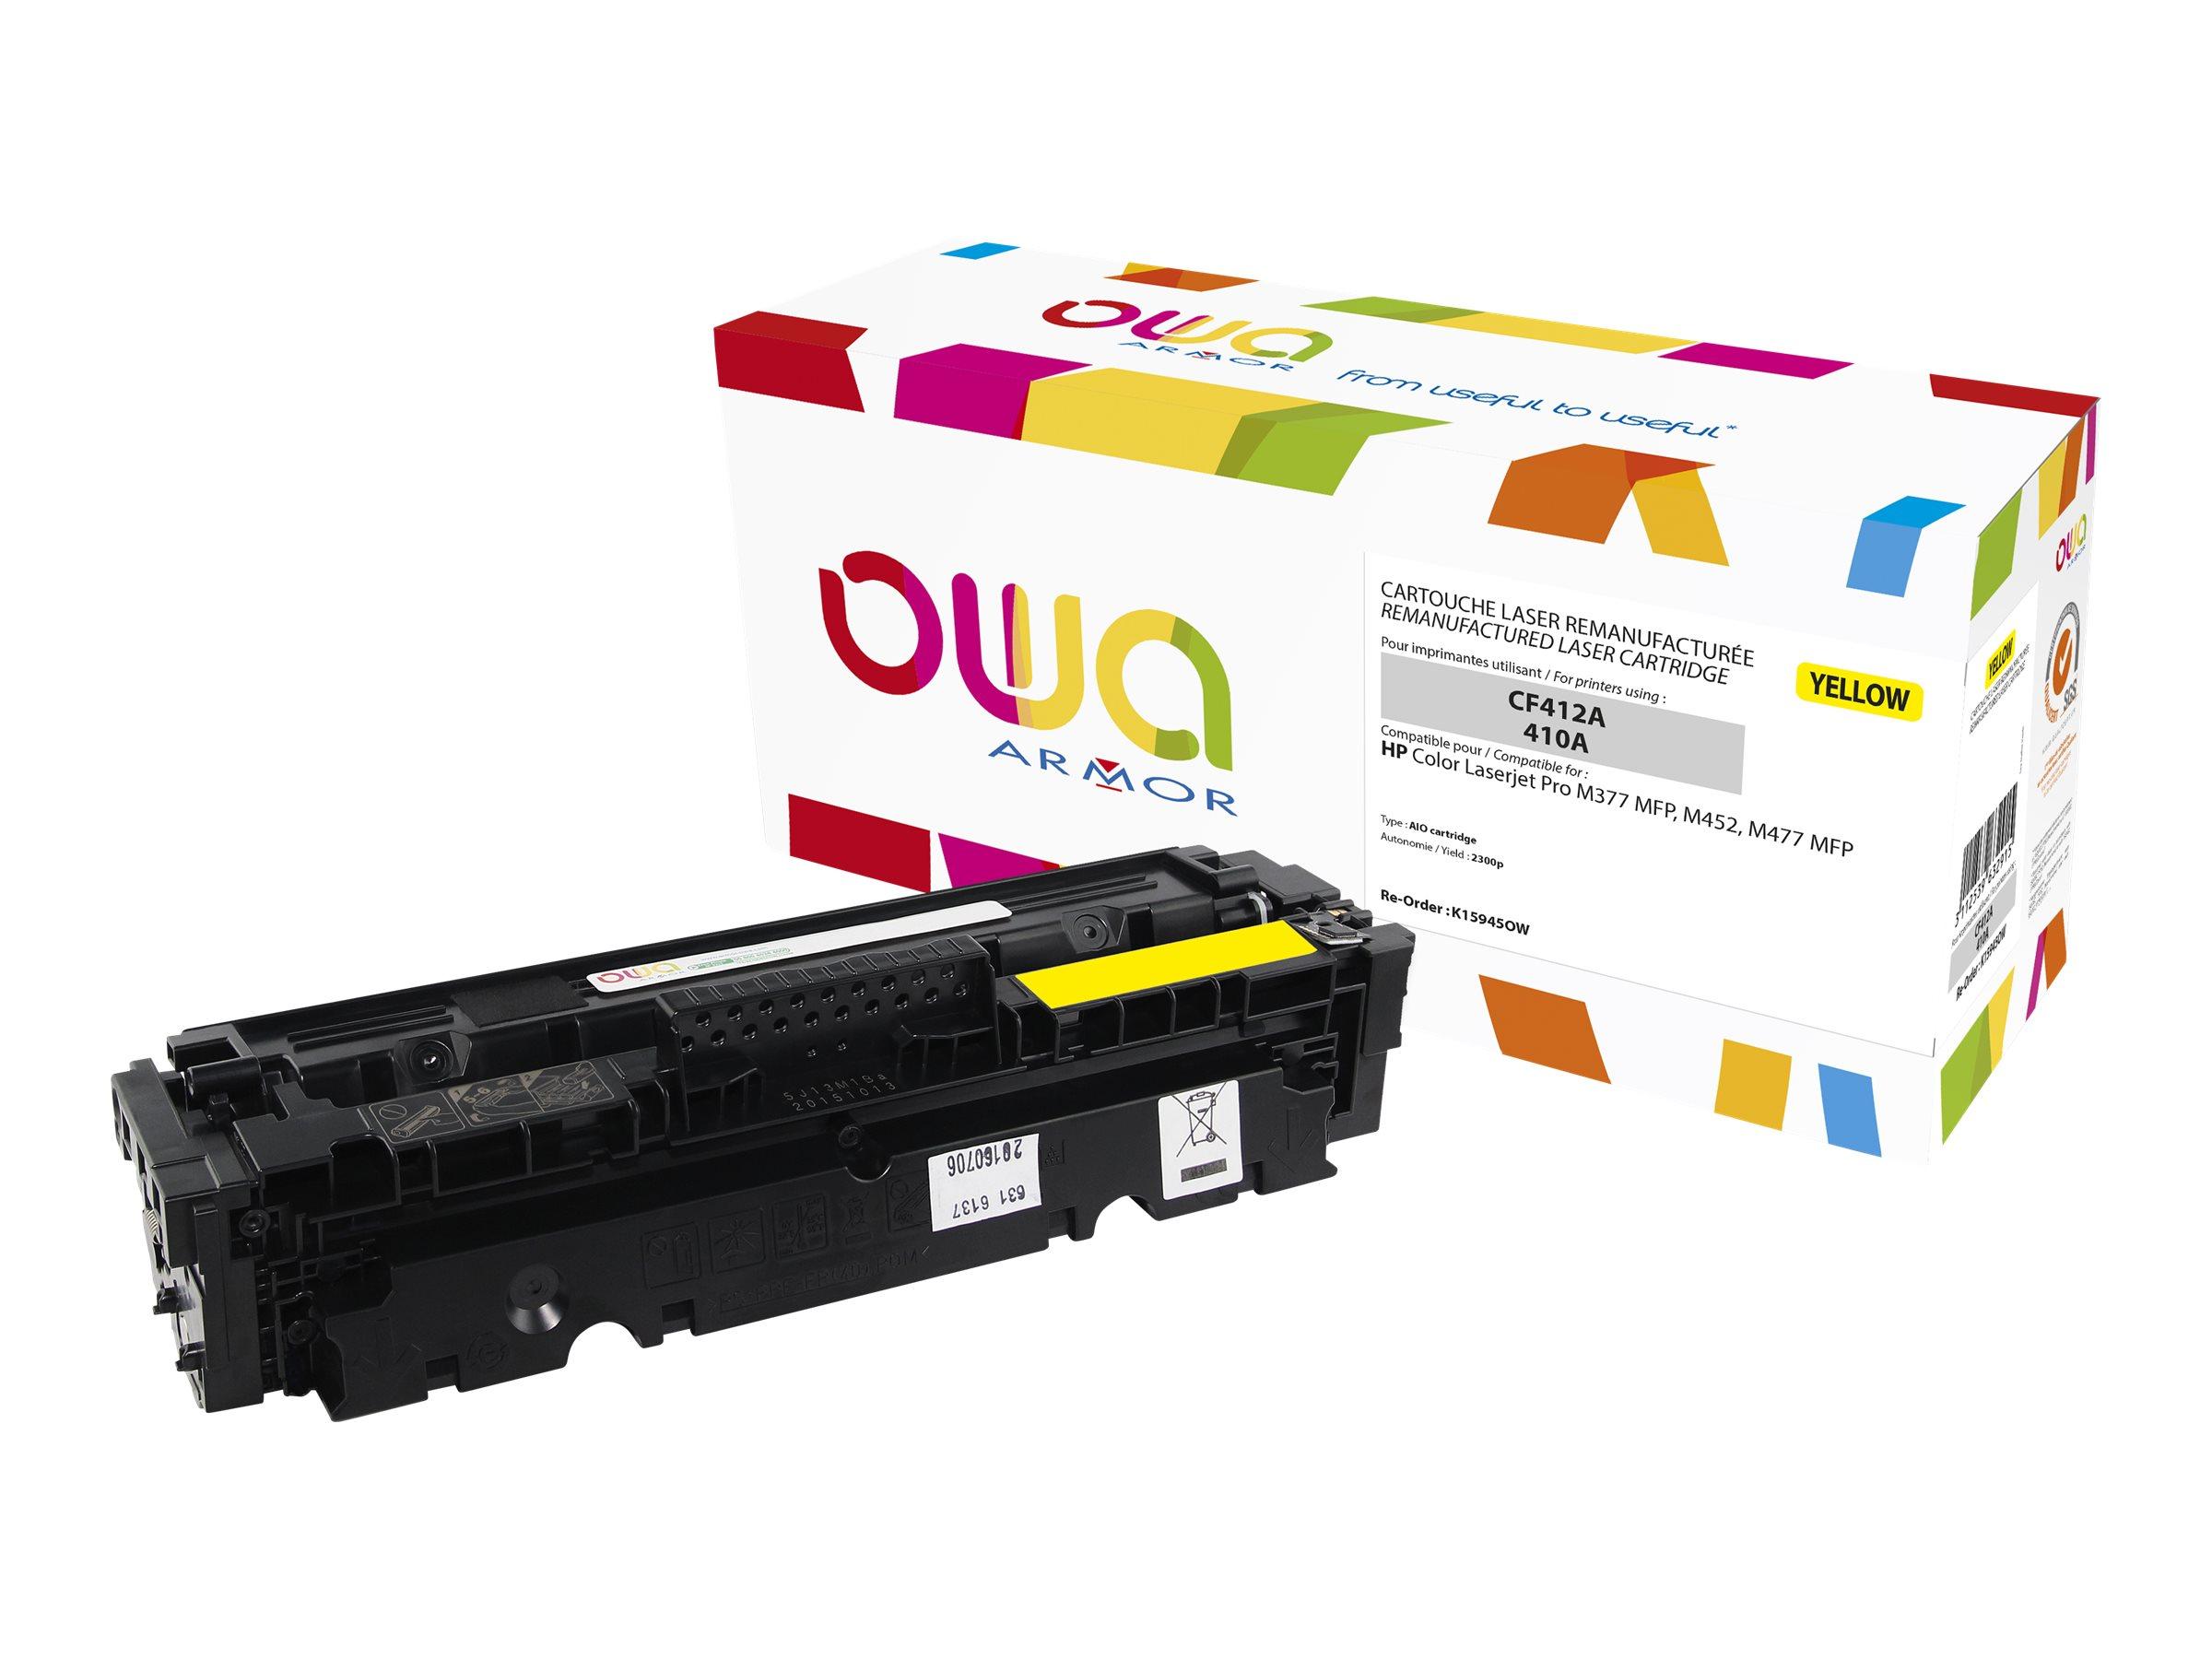 Owa K15945OW cartouche équivalente HP 410A - jaune